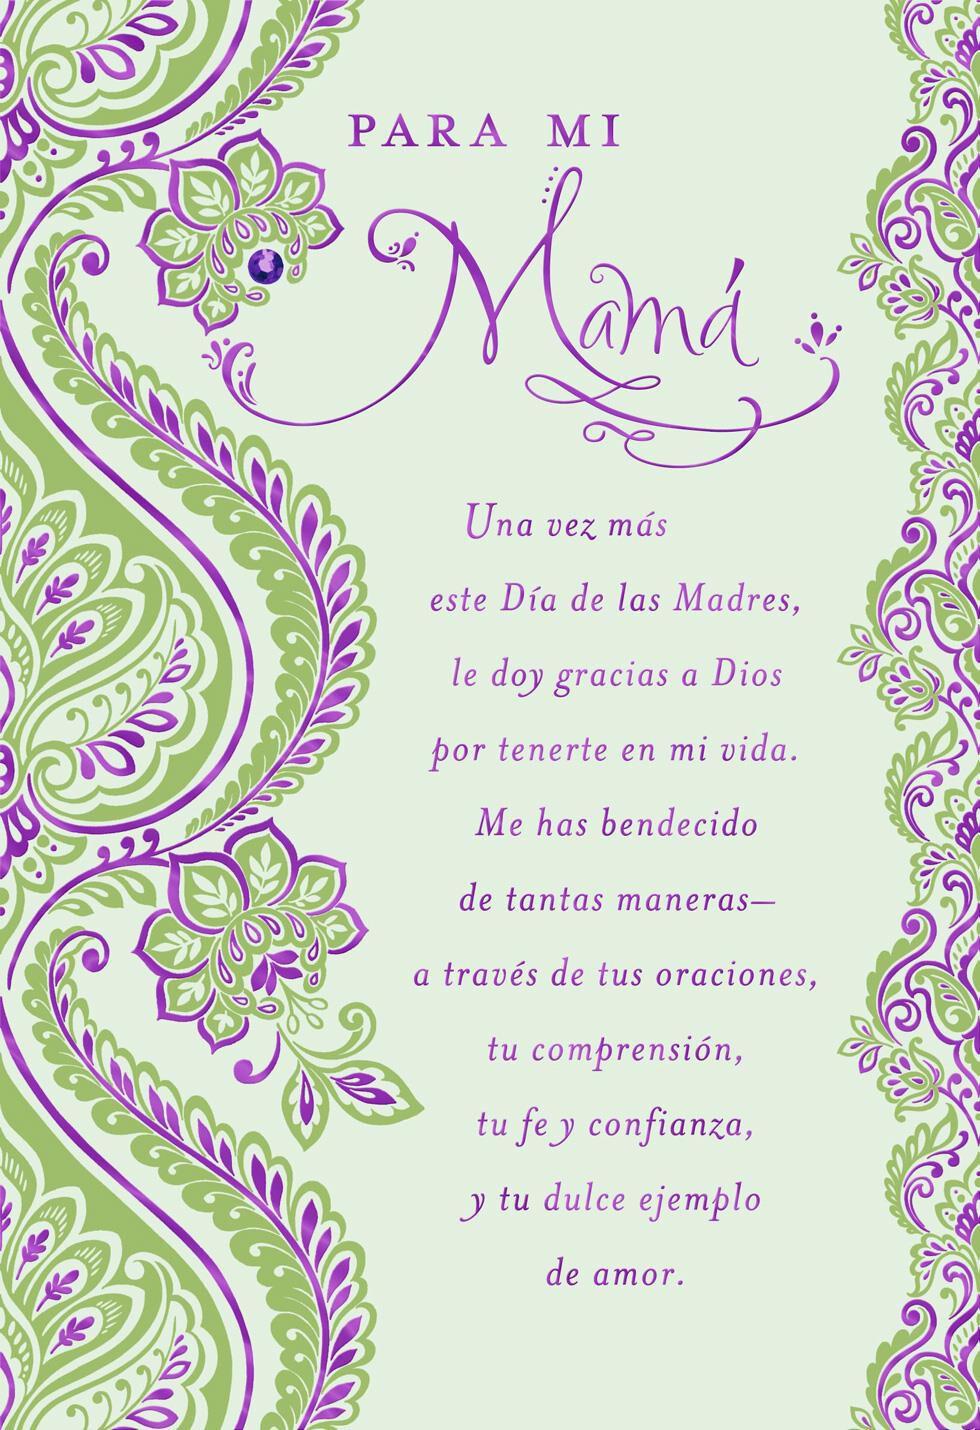 Paisley Flowers SpanishLanguage Religious Mothers Day Card